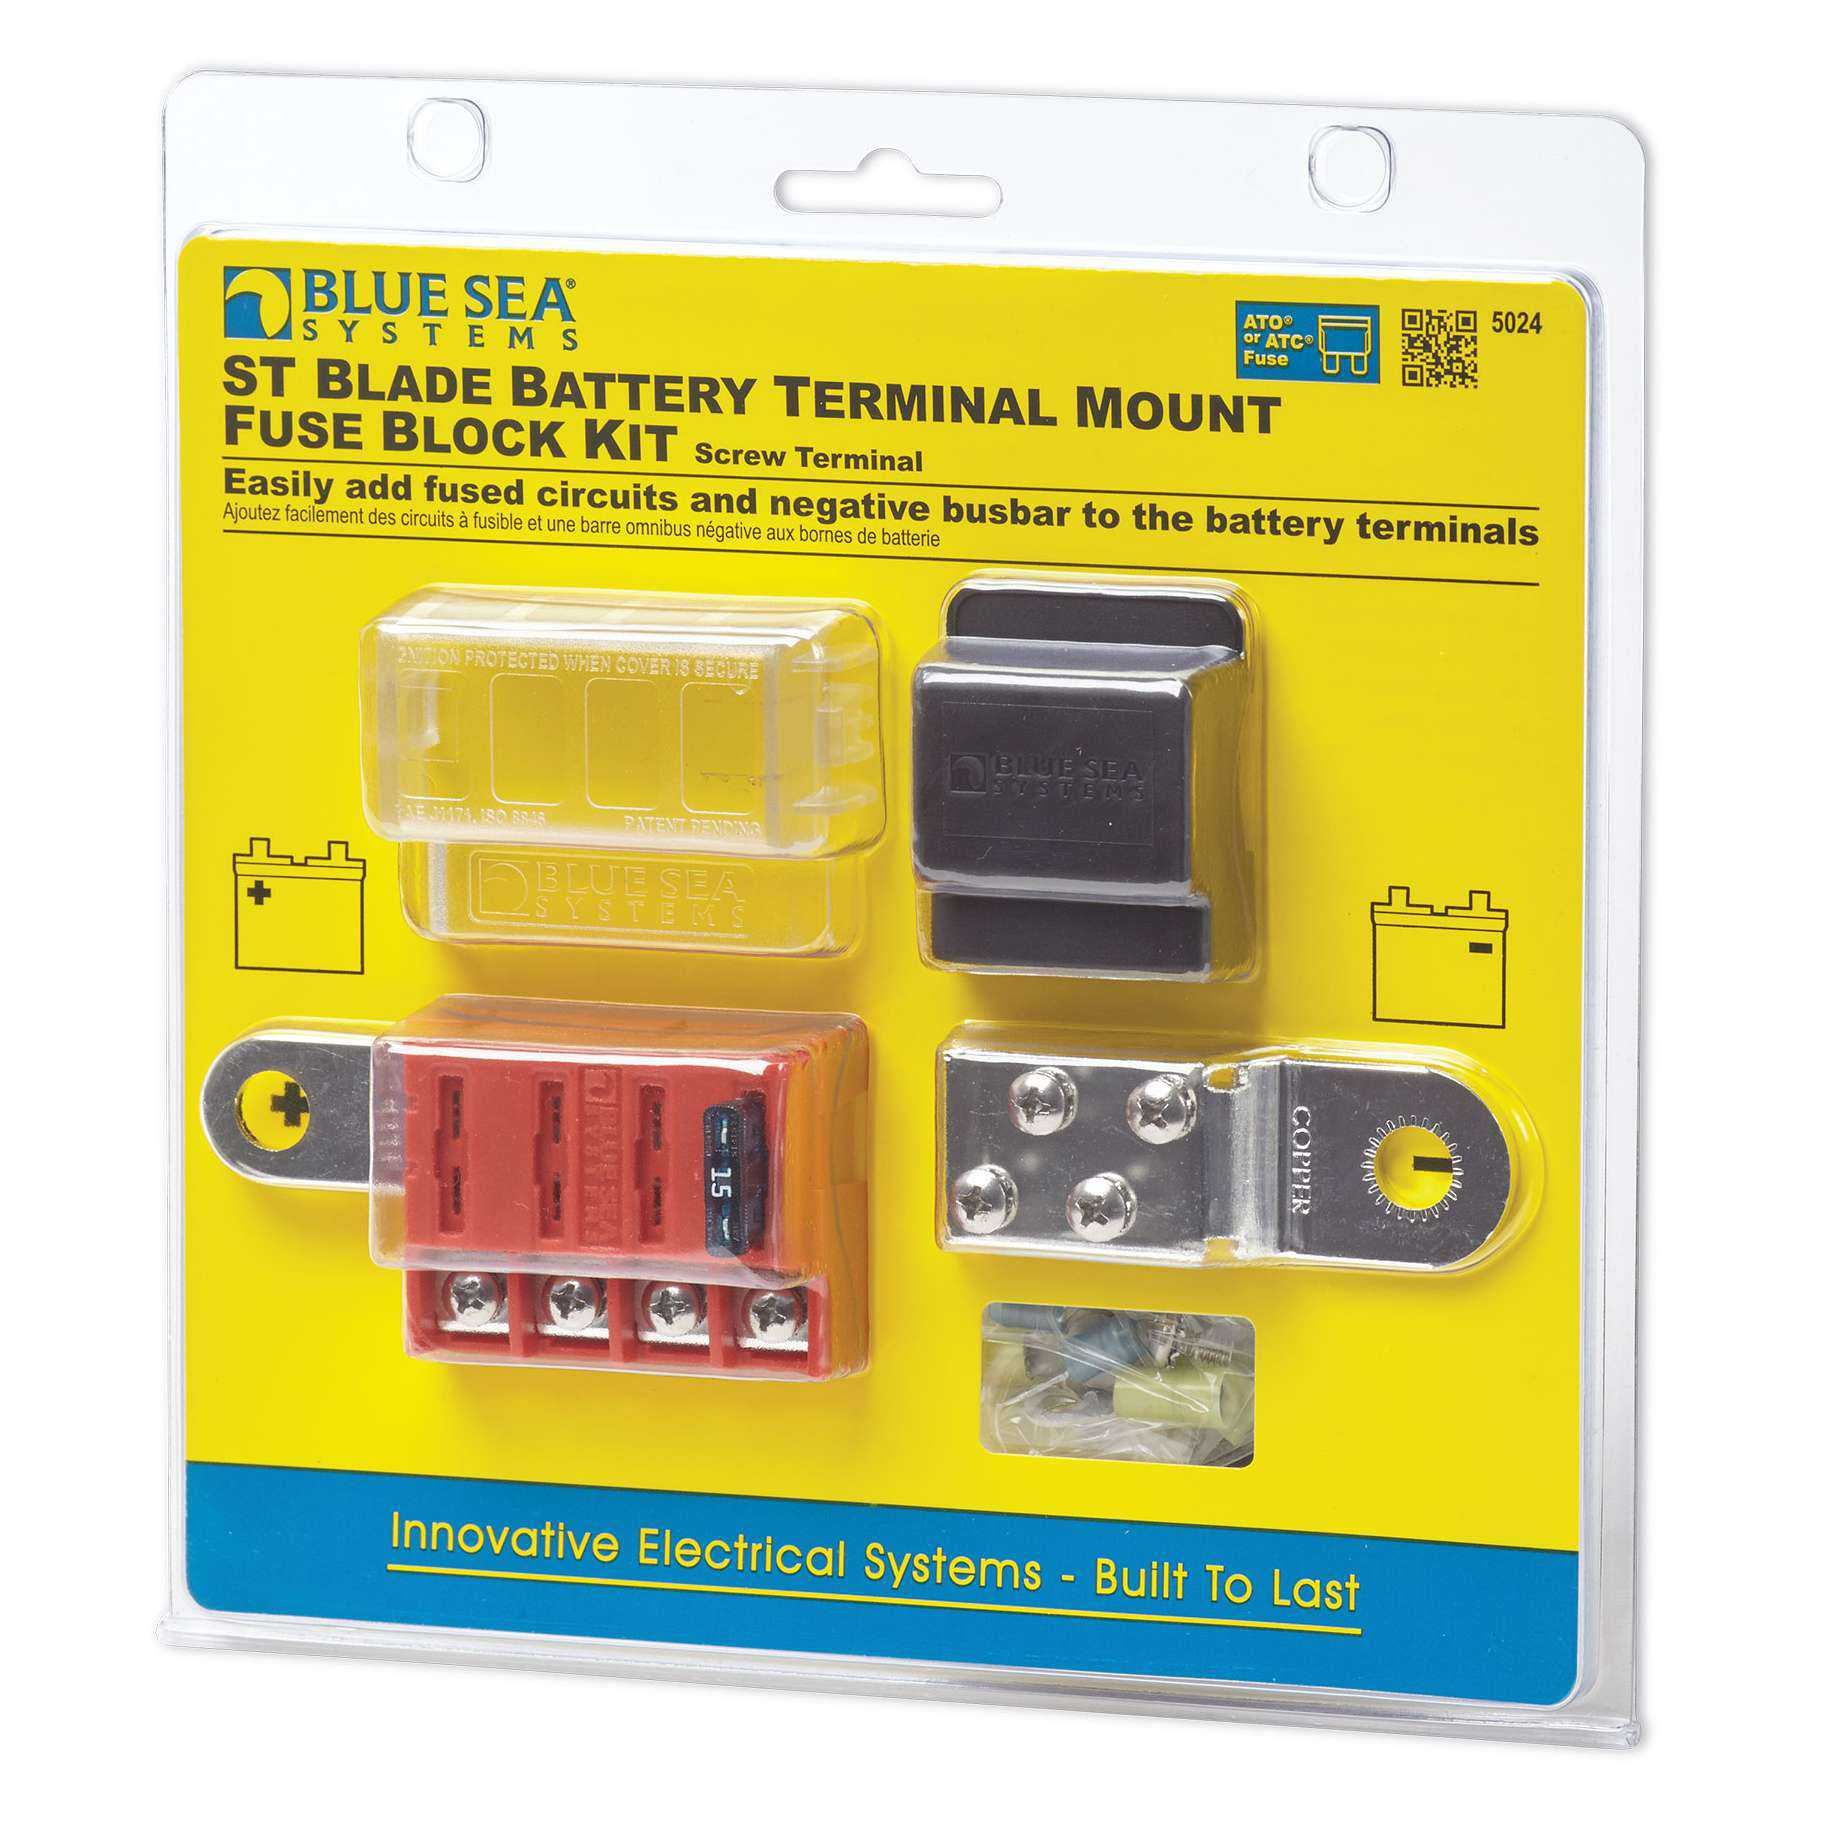 blue sea 5024 marine st blade battery terminal mount fuse block